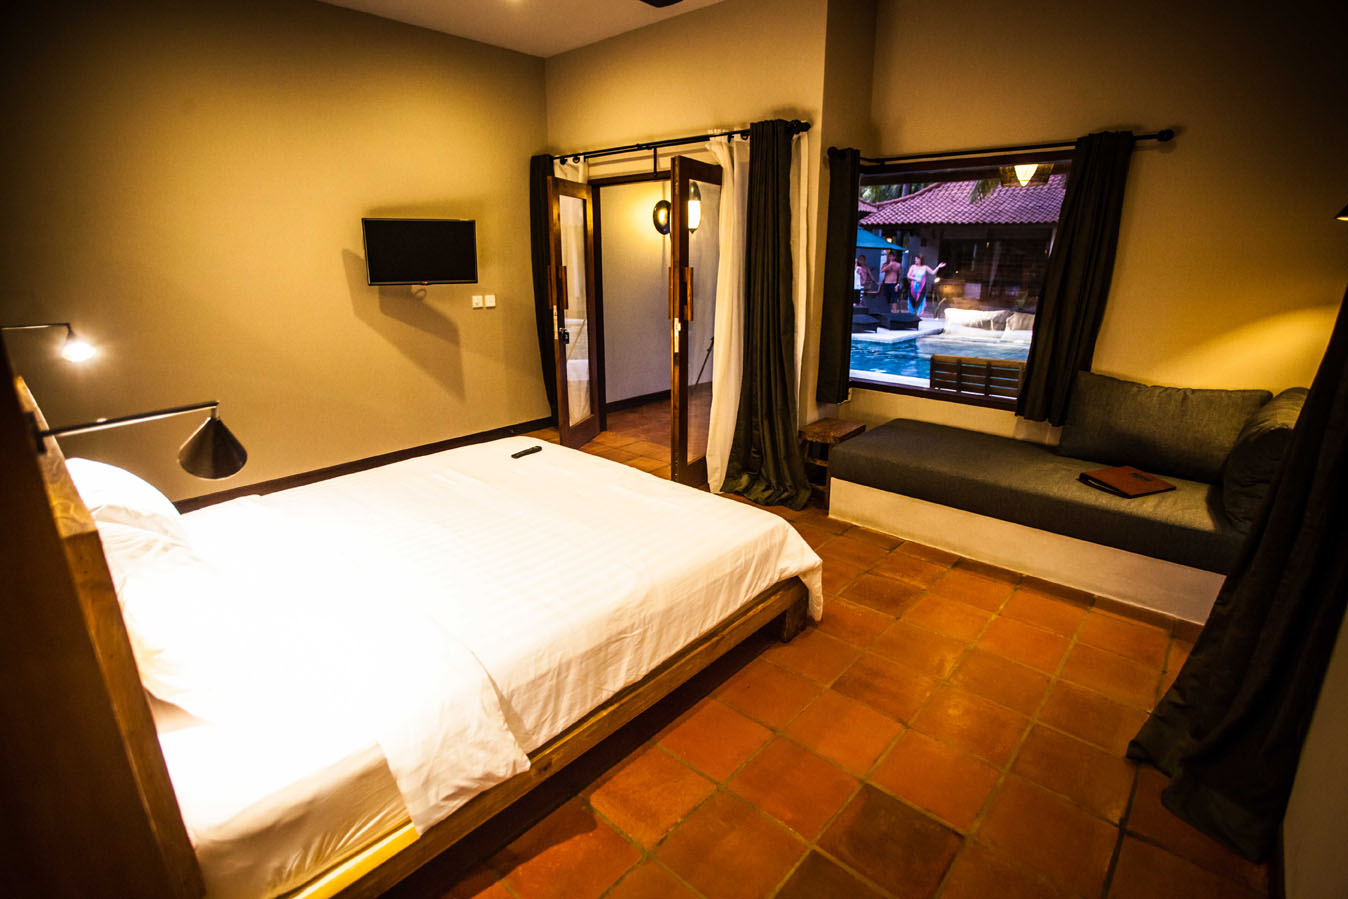 Tropical Luxury Hotel Bedroom : Belukar: Luxury holiday villa resort hotel rooms at an amazing price ...